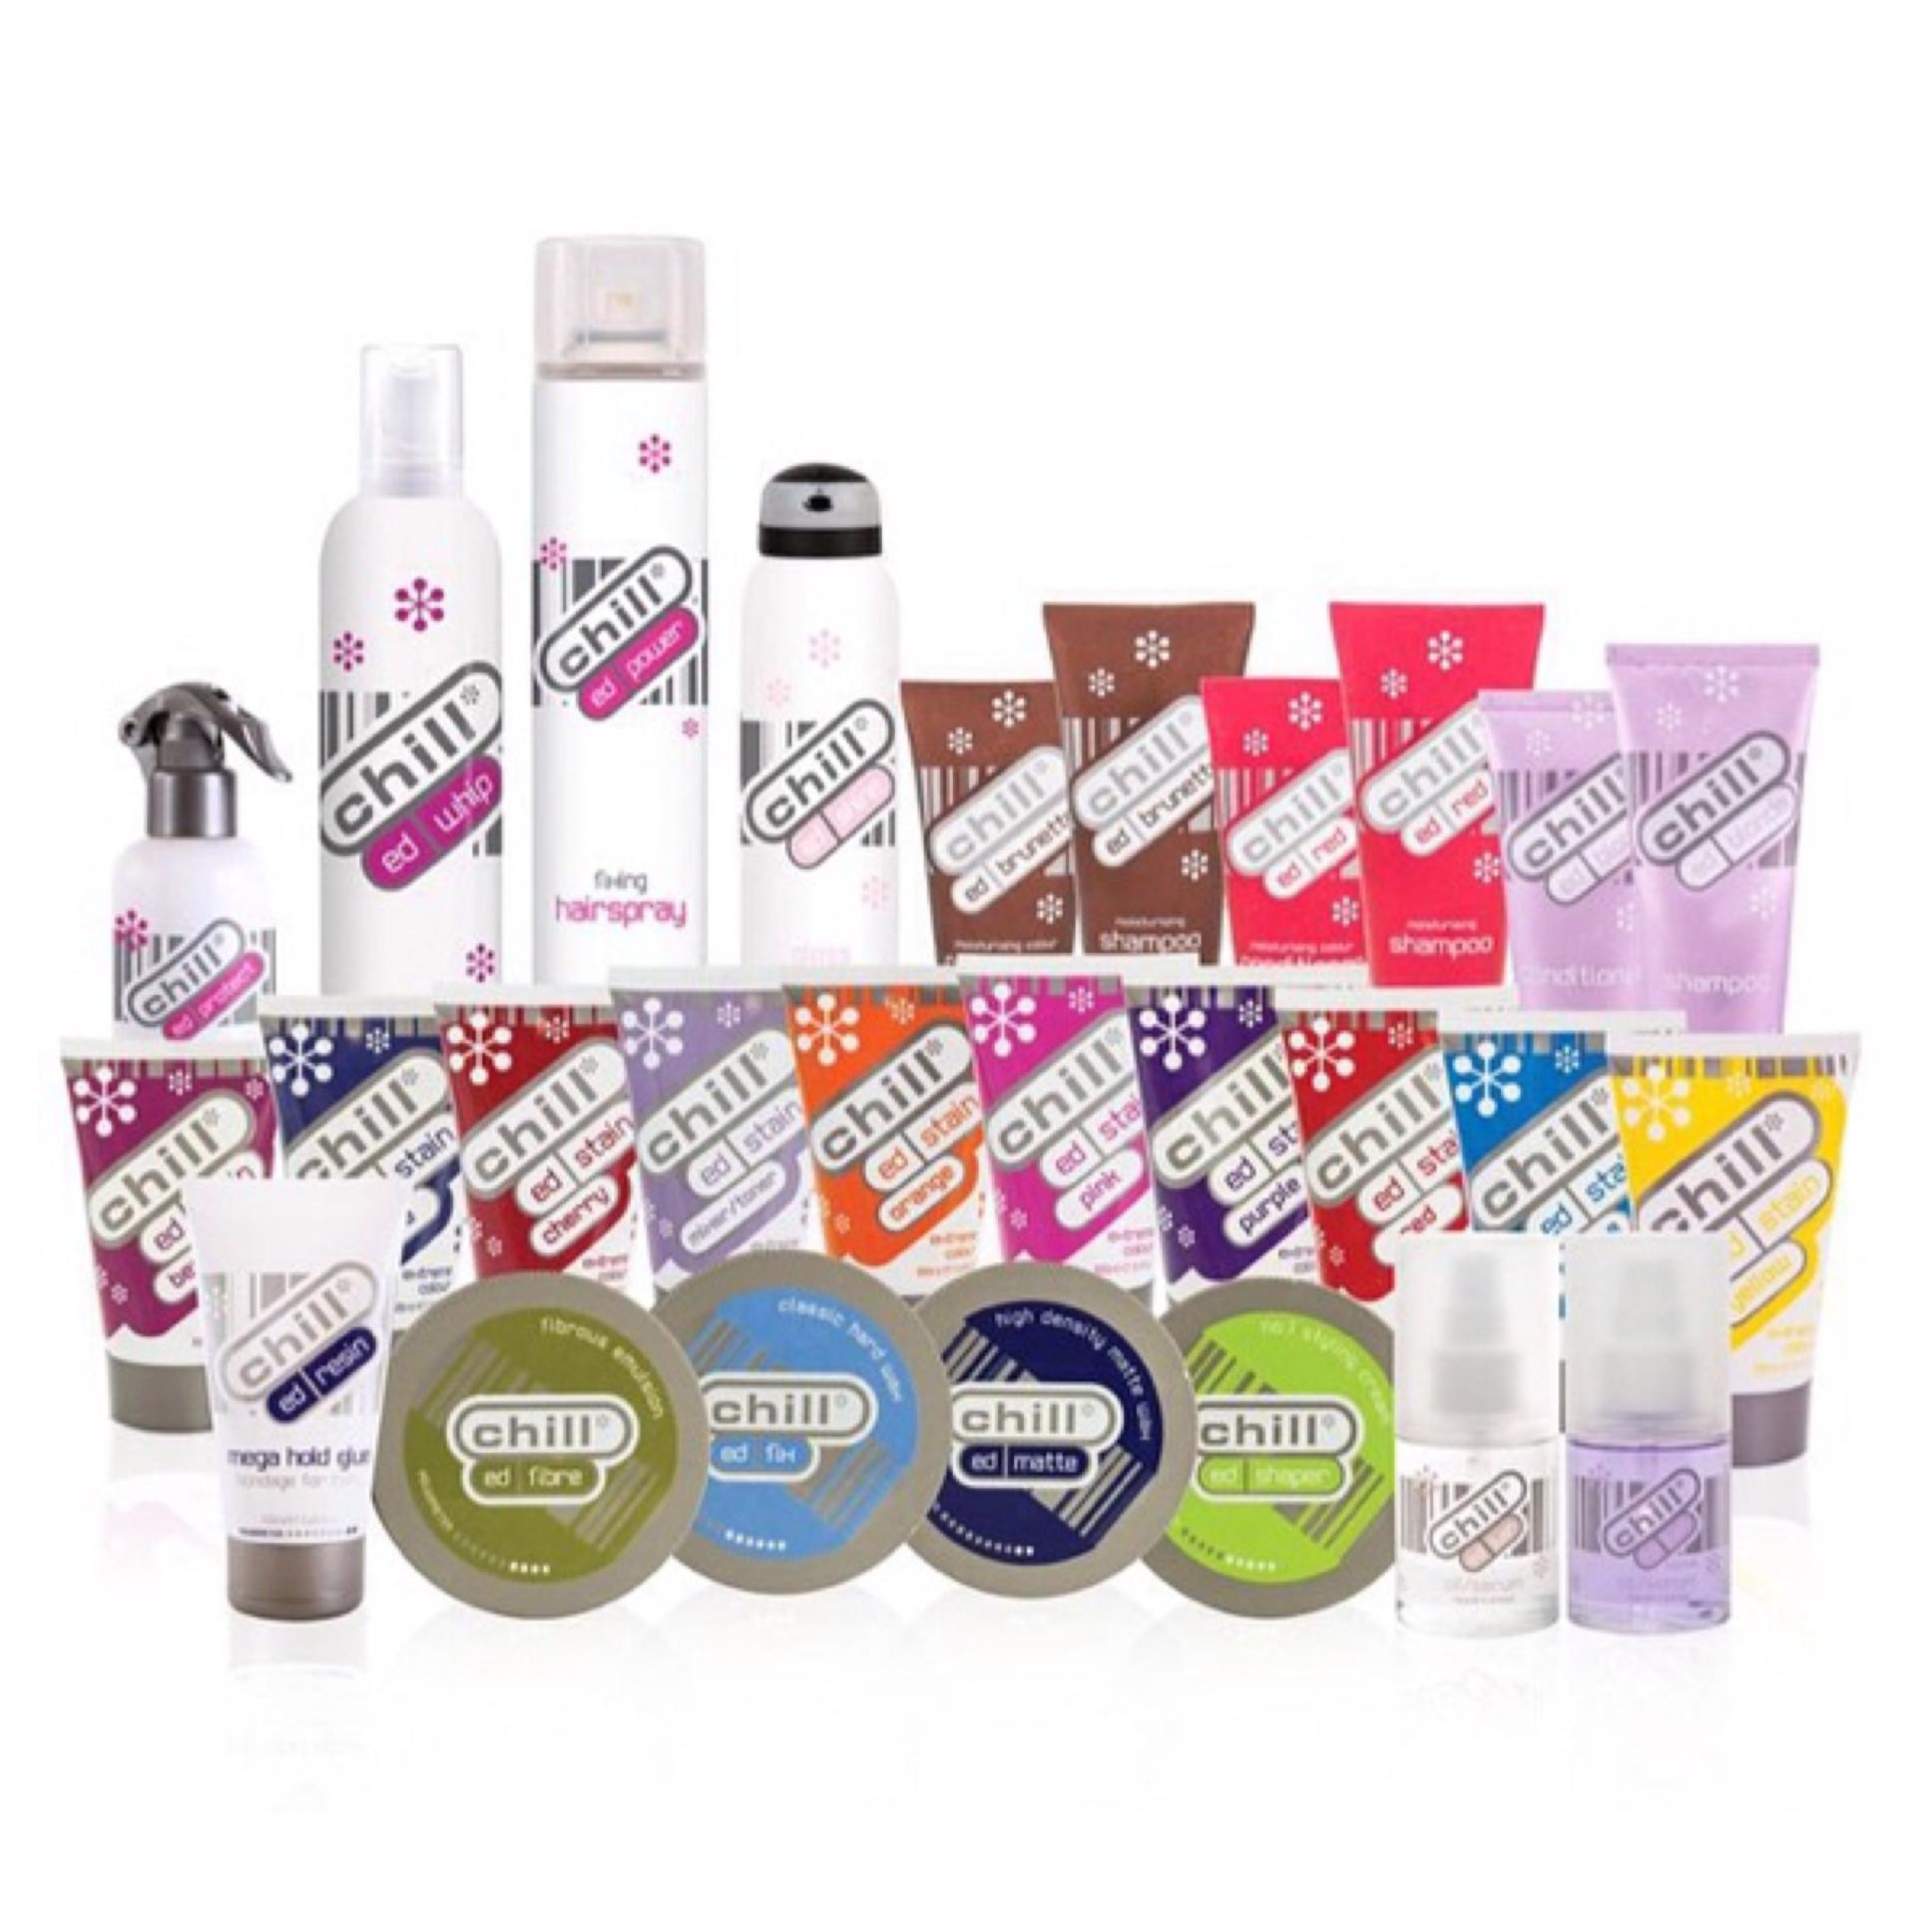 chill* Heats Up: British Brand Offers Bold, Brilliant Color